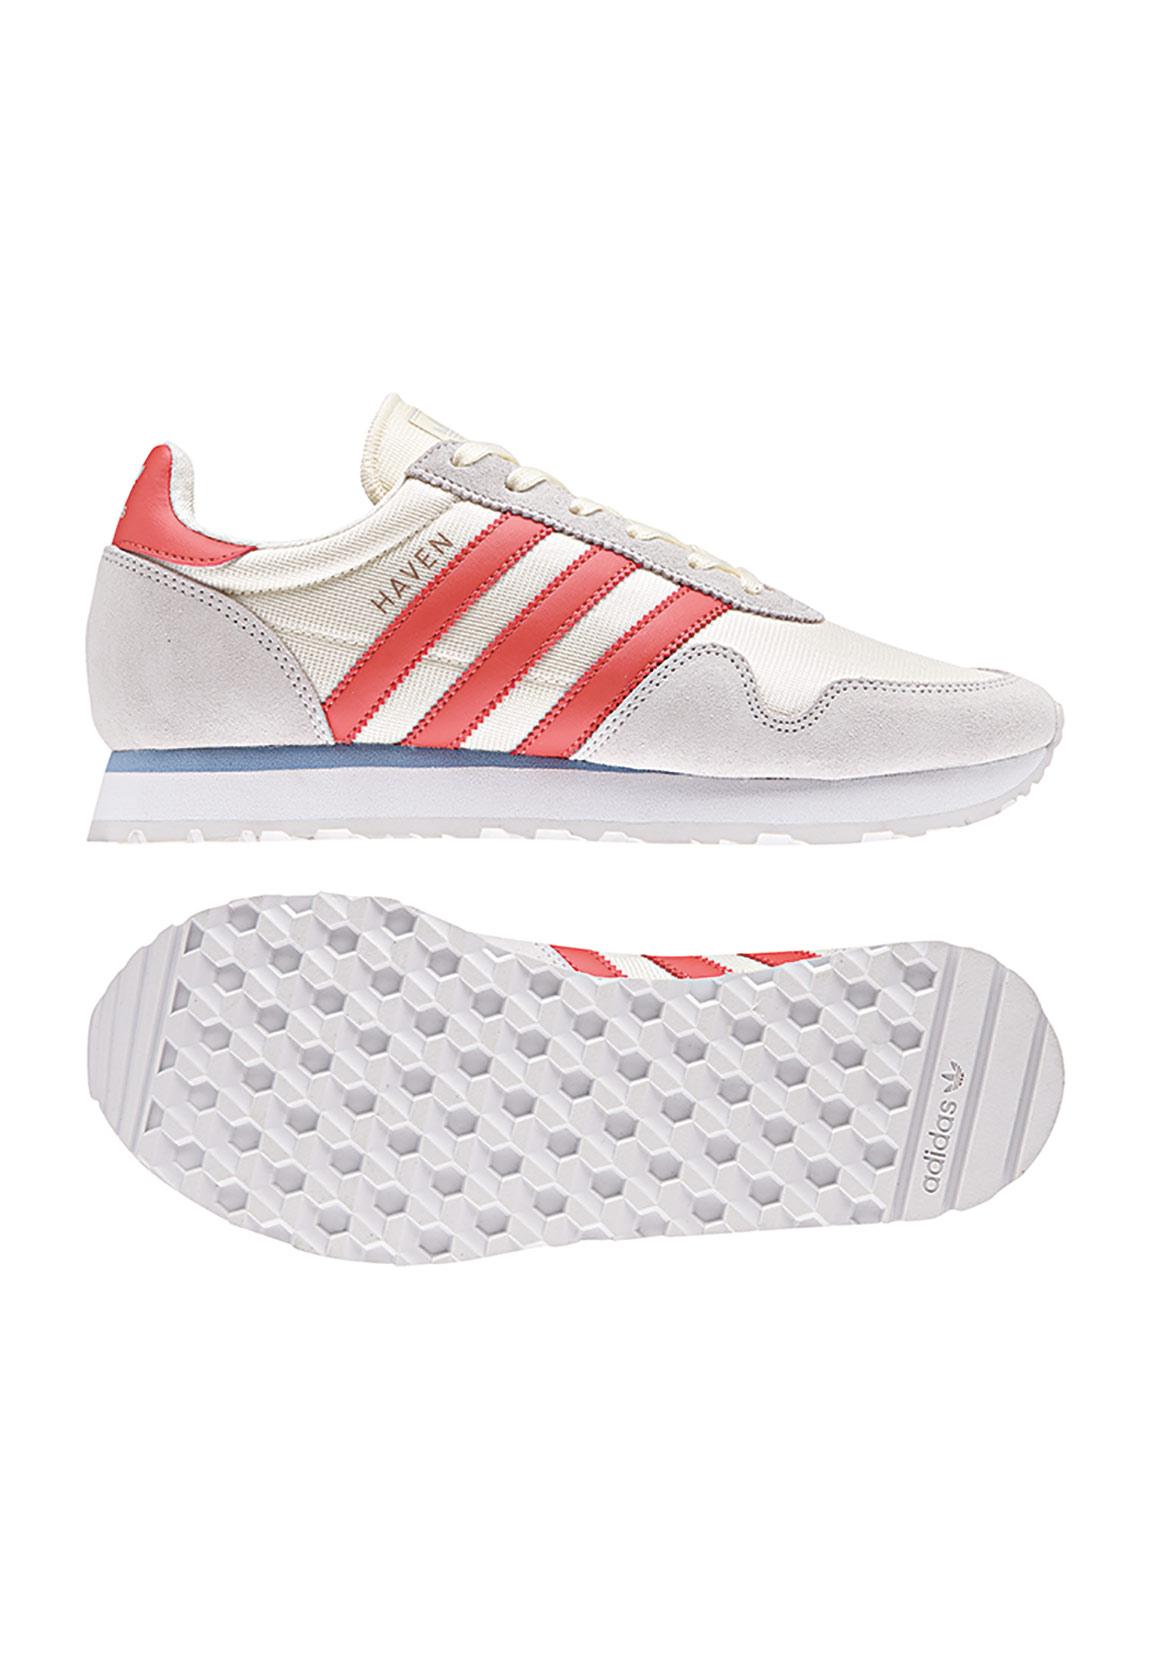 Adidas Haven W Damen 41 1/3 Grau P6iy6